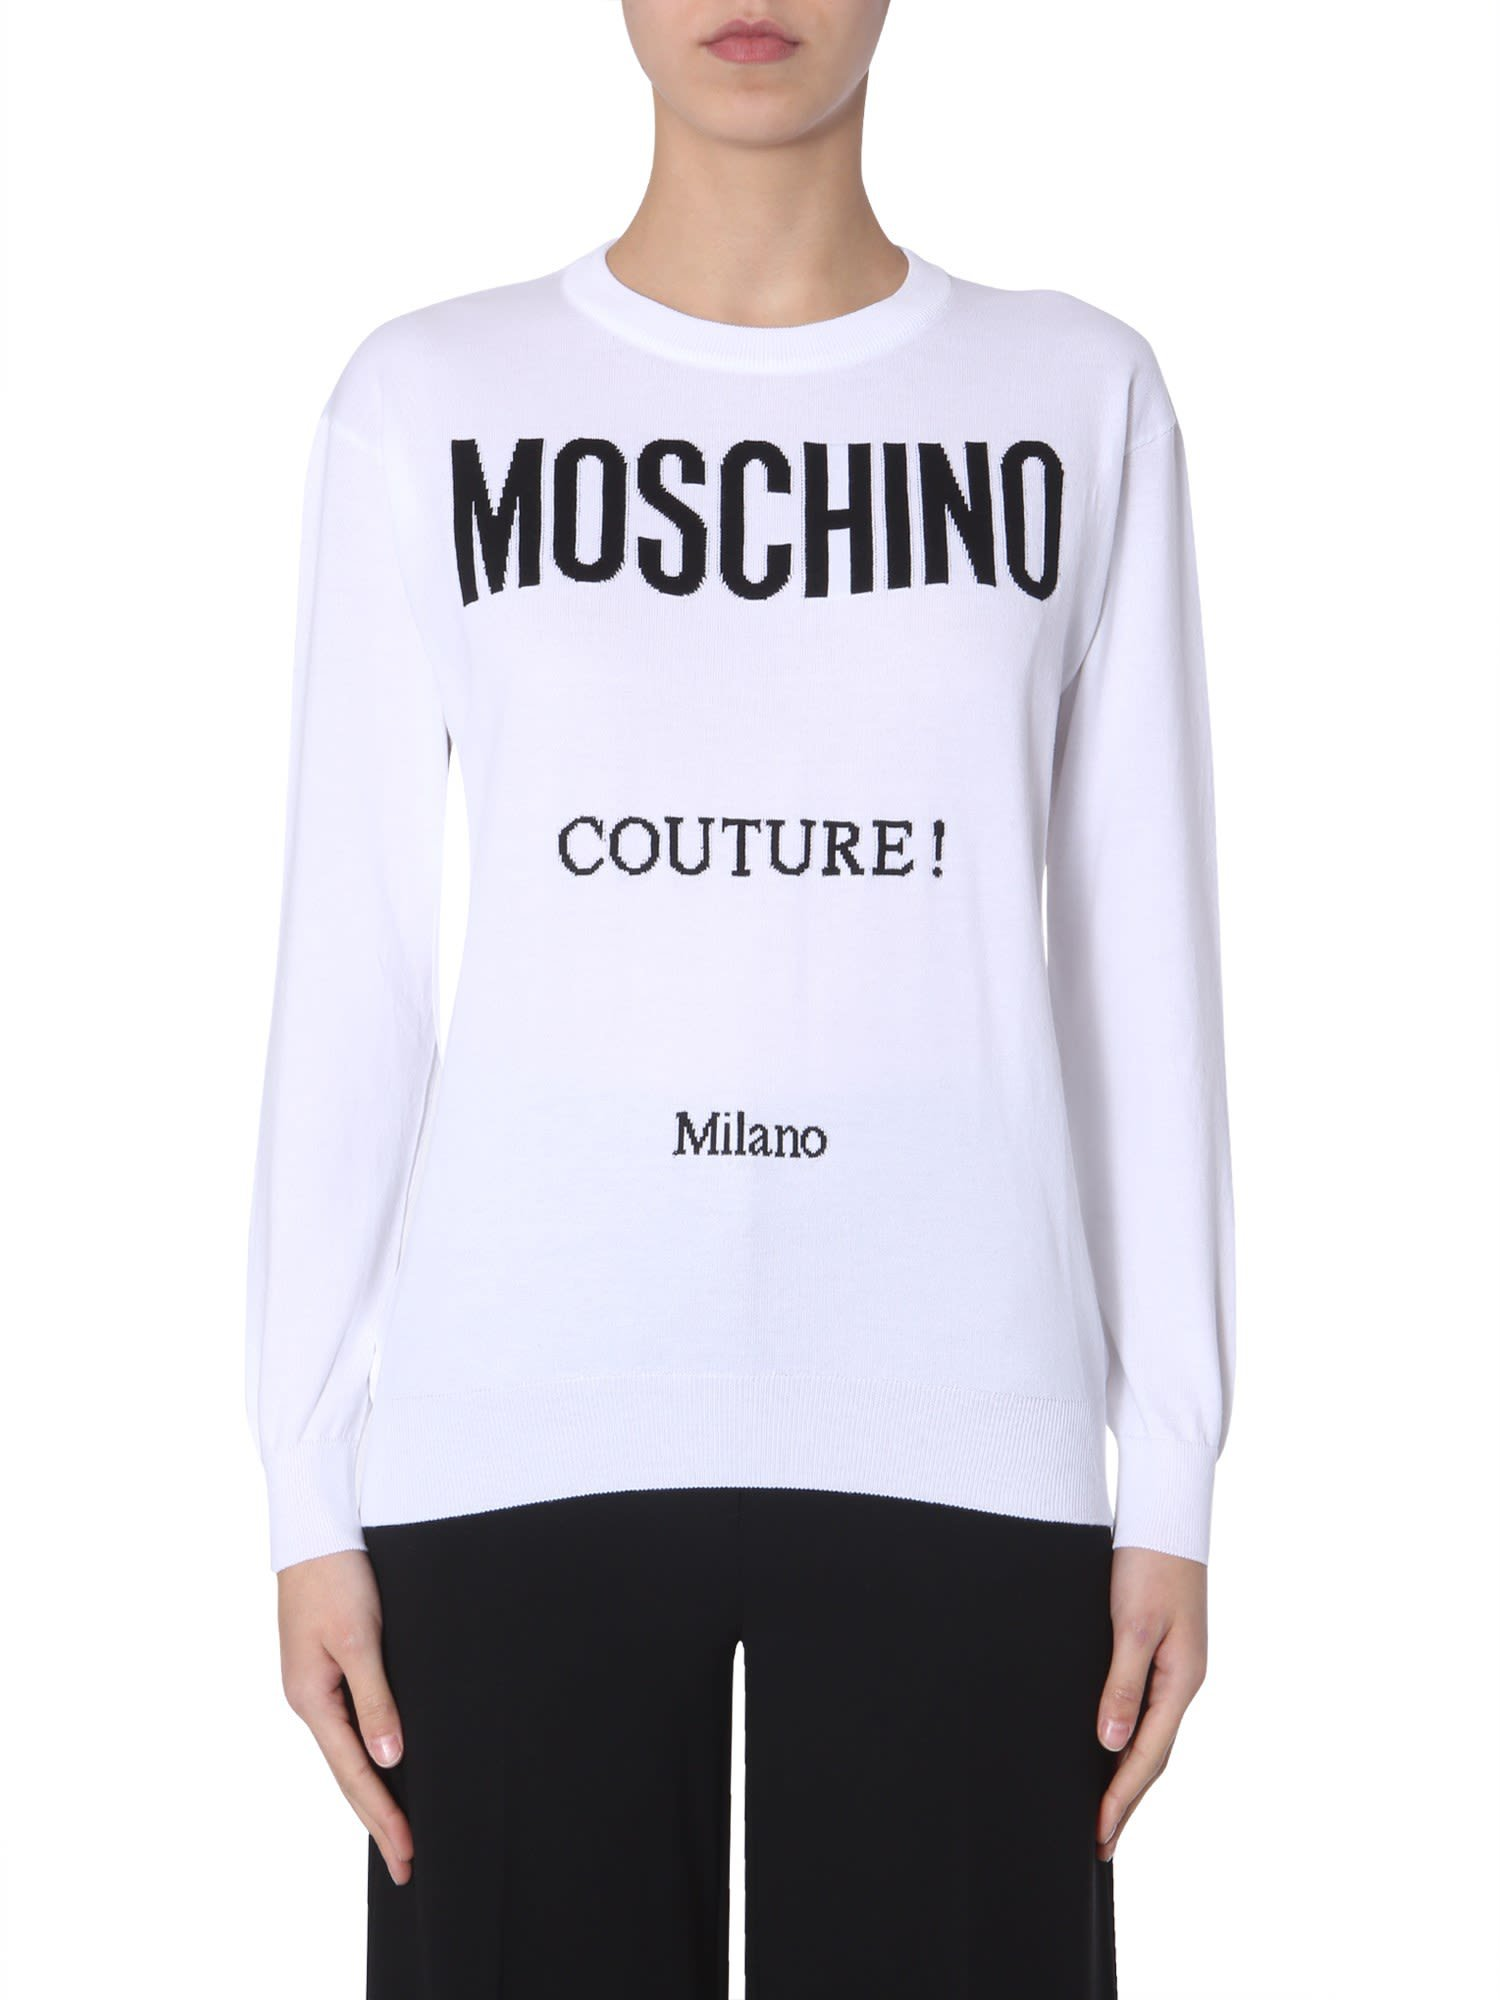 Moschino Cotton Sweater